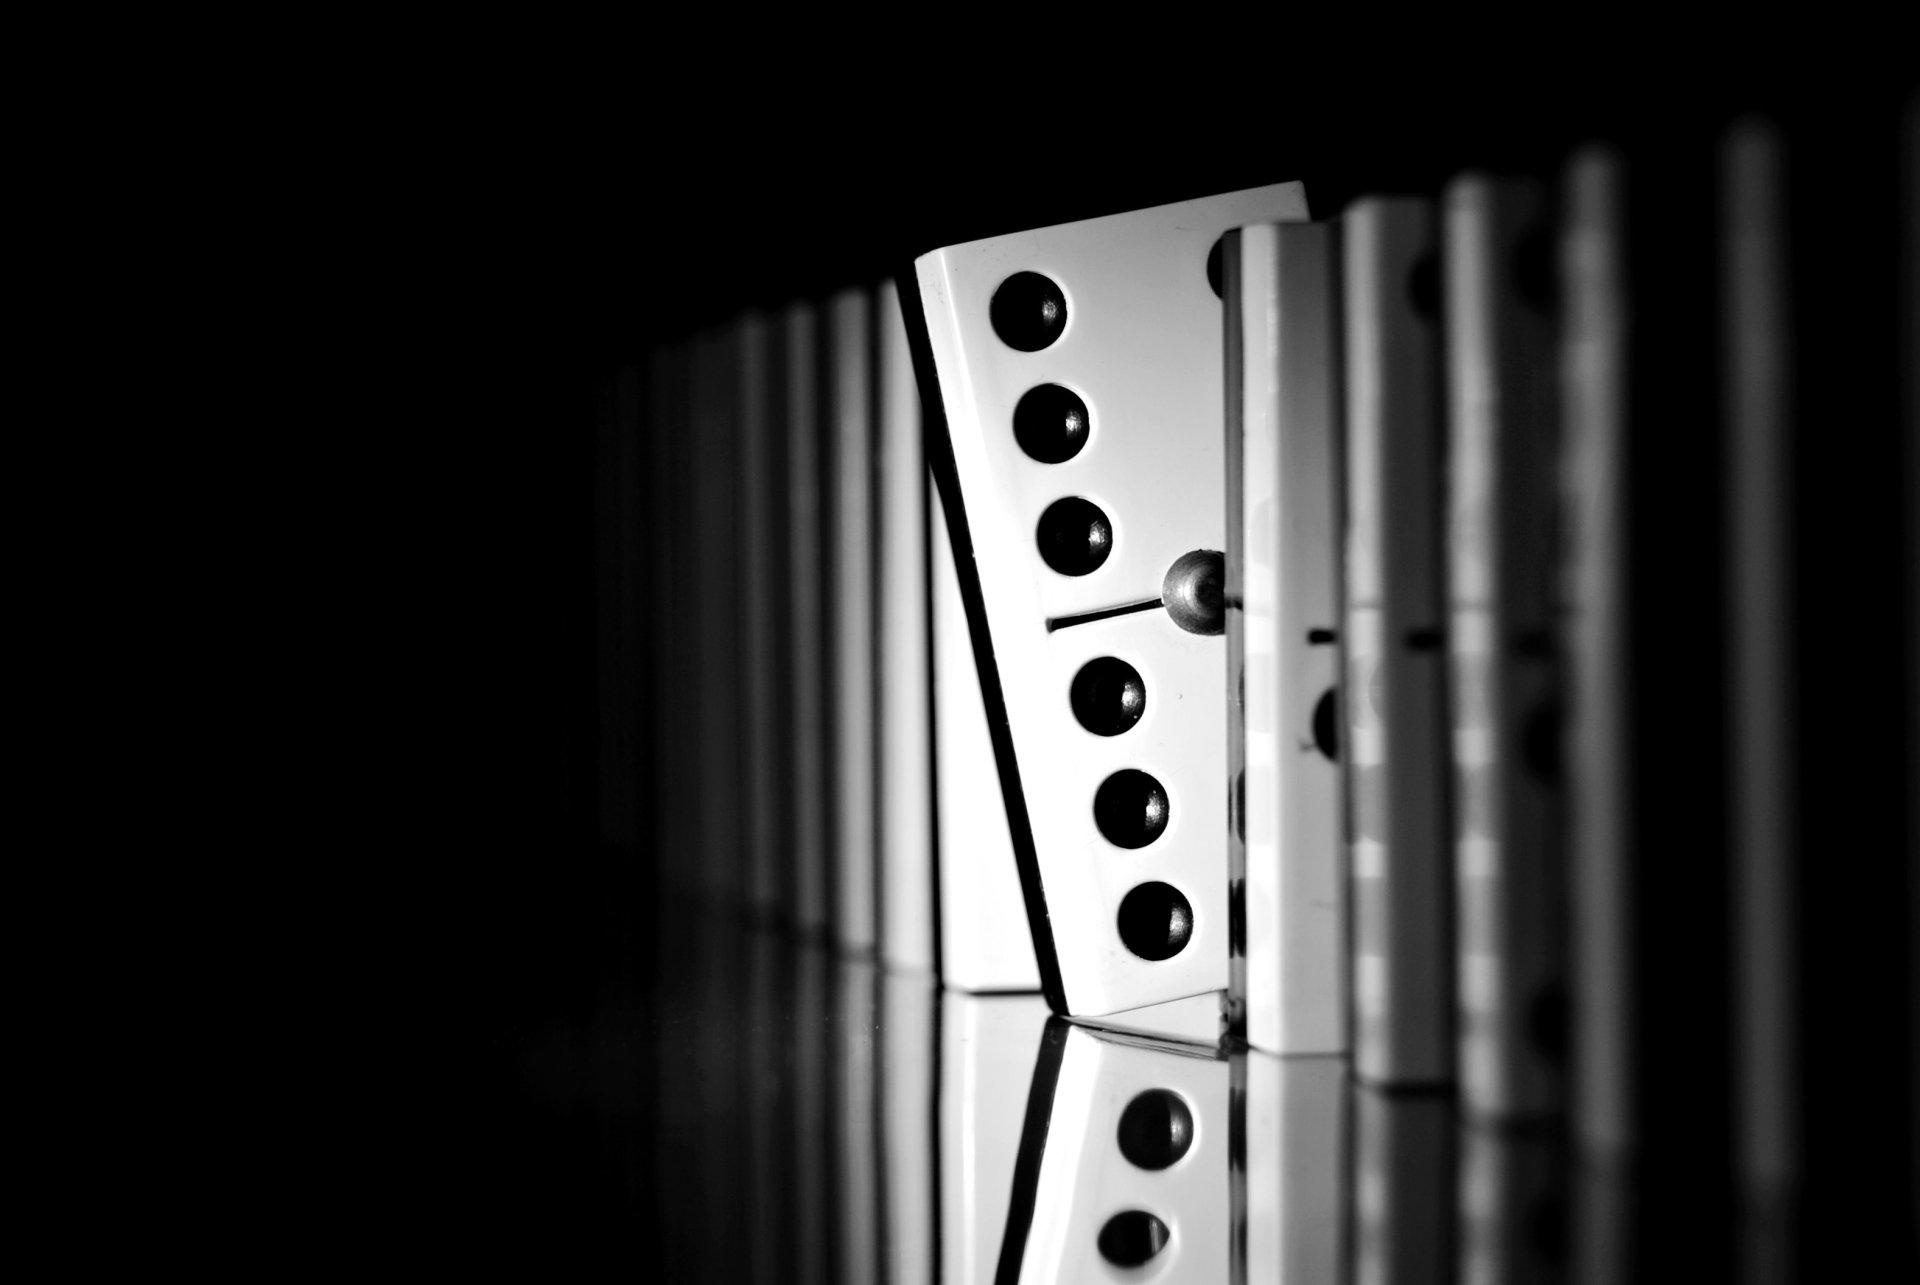 Game - Dominos  Wallpaper